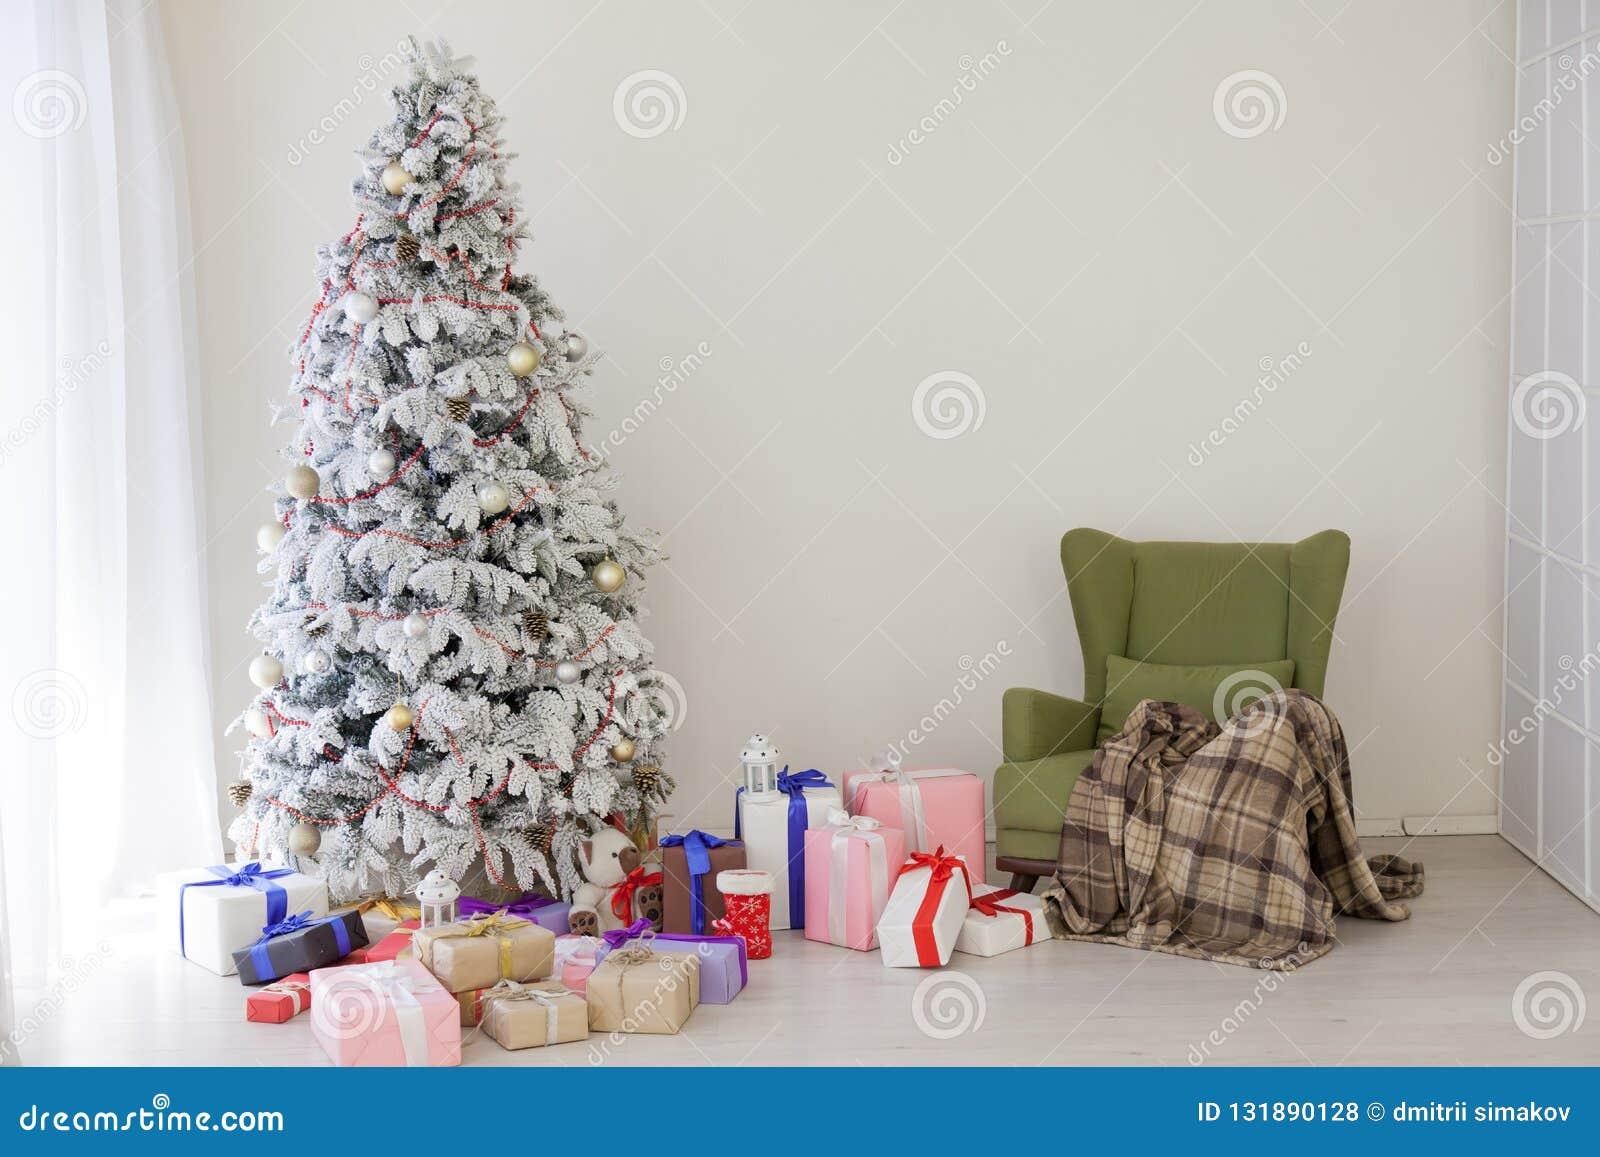 Christmas tree decor Interior white room new year gifts holidays. Christmas tree decor Interior white room new year holidays royalty free stock photos